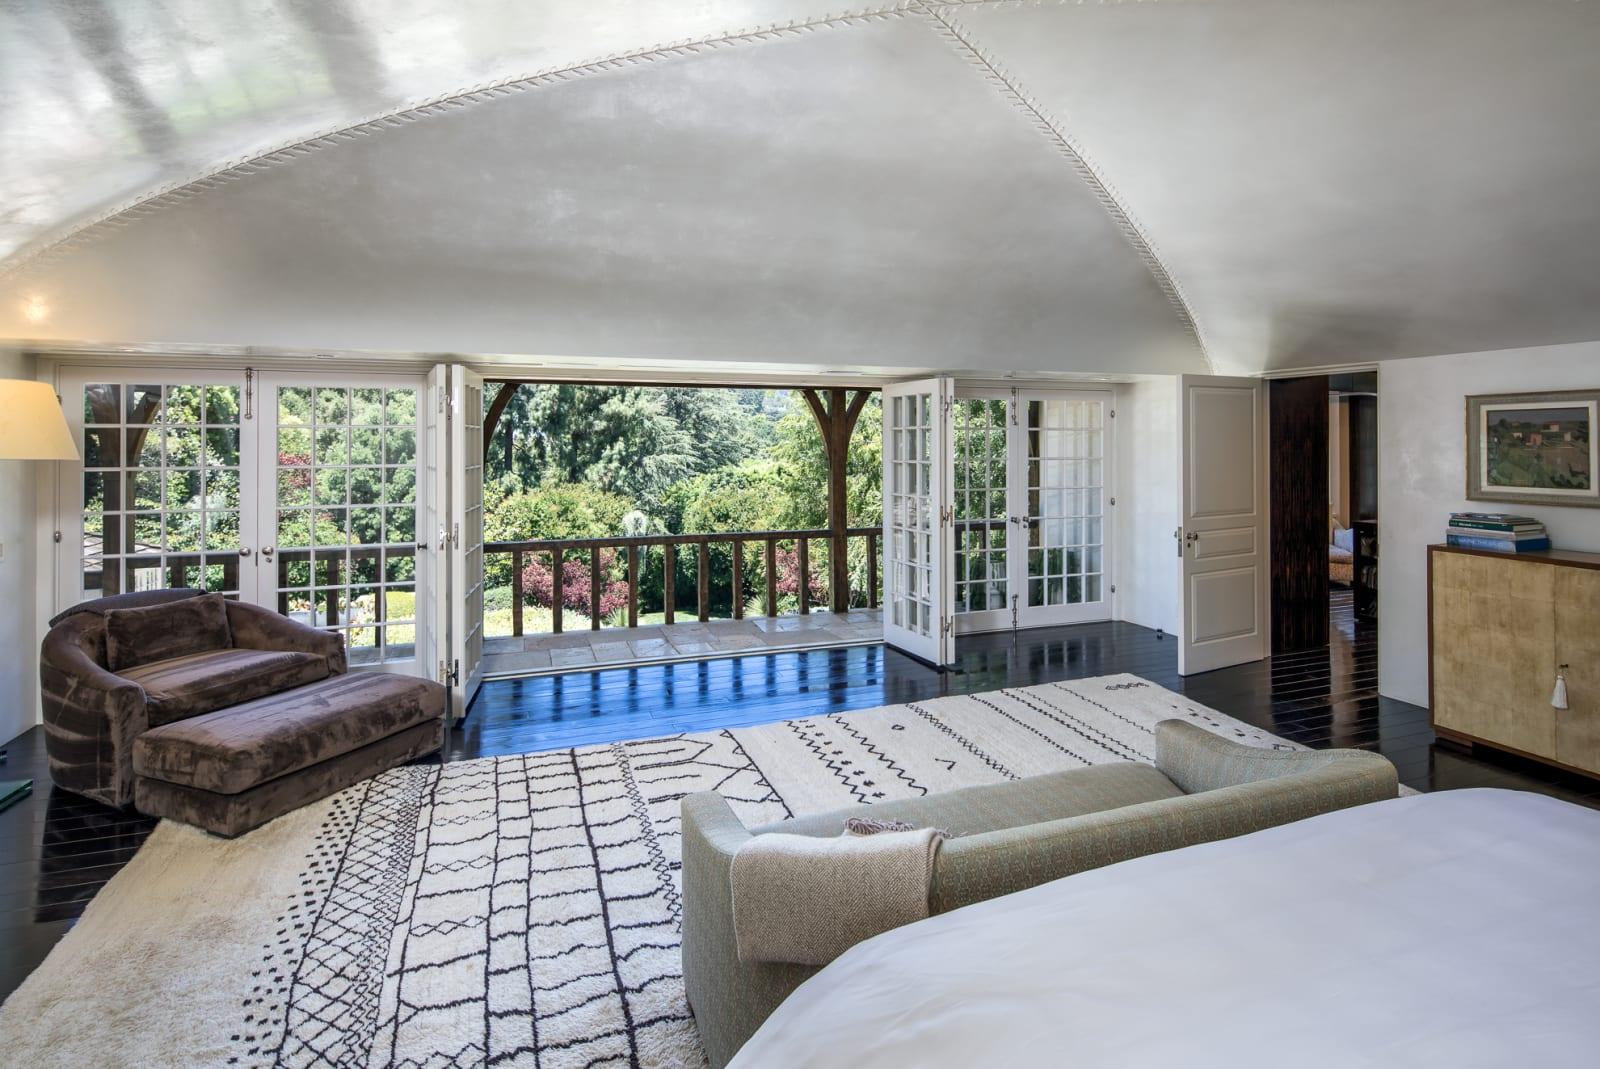 La habitación de la casa de Brad Pitt y Jennifer Aniston